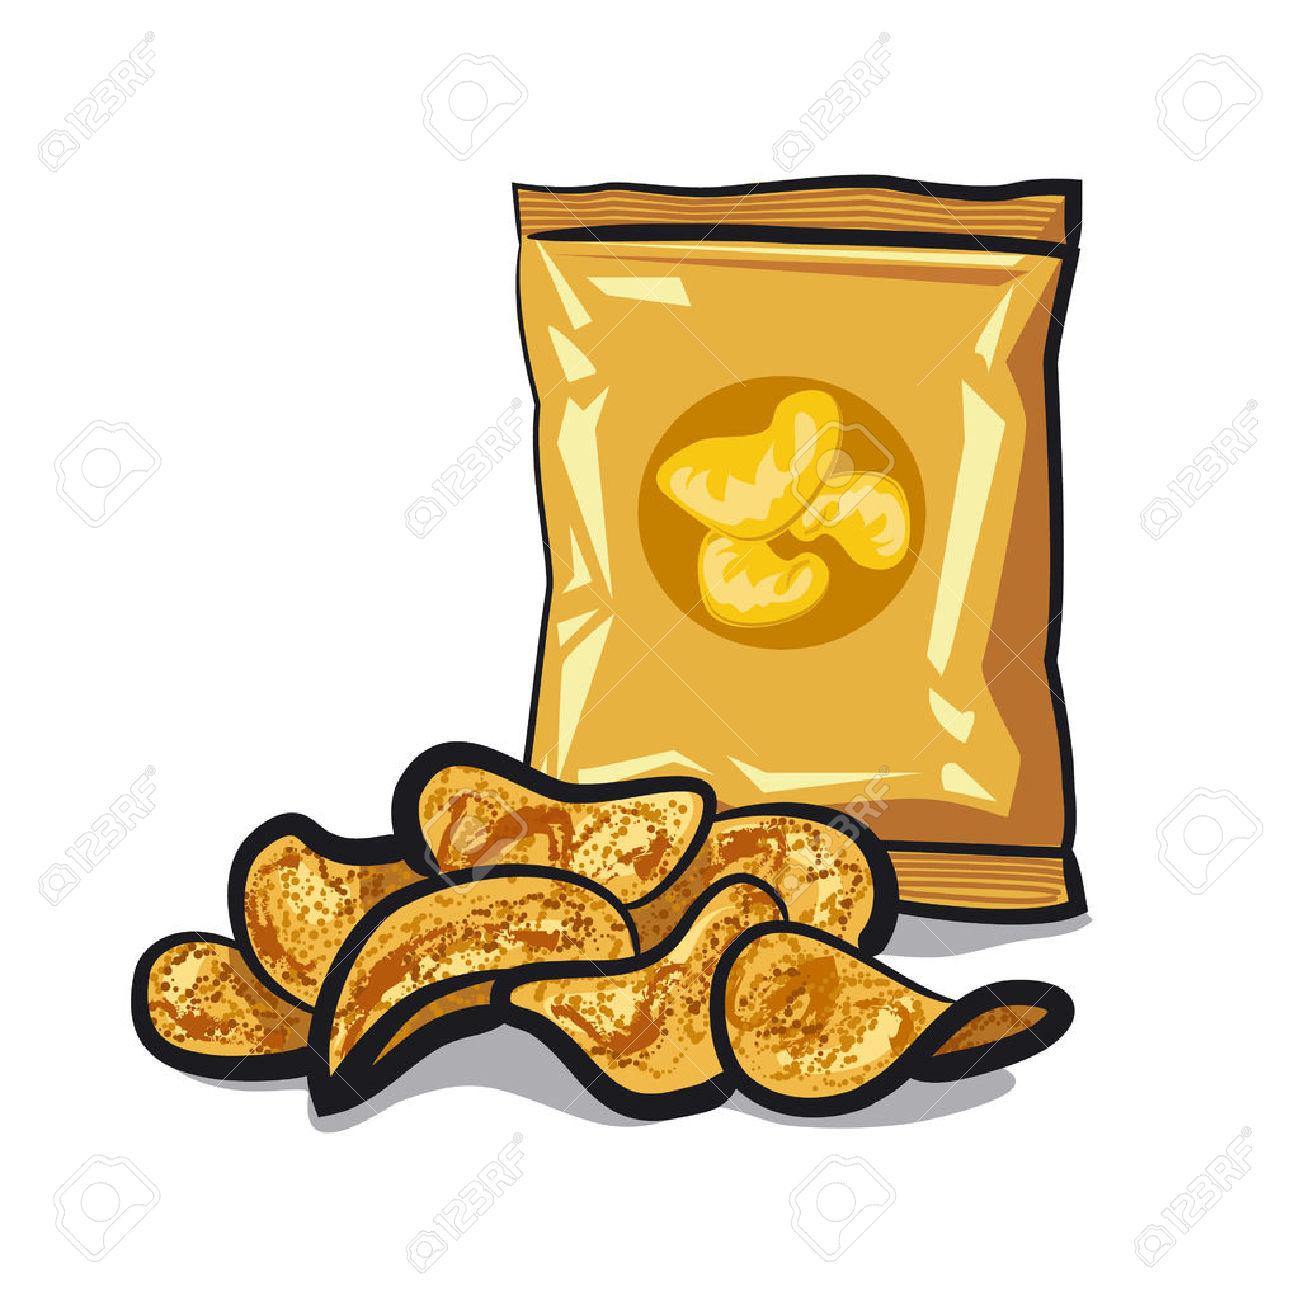 Chip clipart potato chip. Free download best